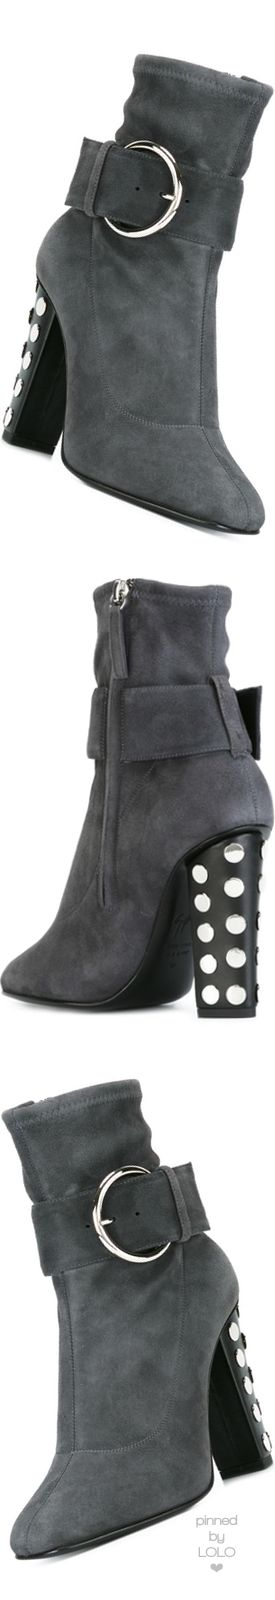 GIUSEPPE ZANOTTI DESIGN Embellished Heel Boots Ferro   LOLO❤︎